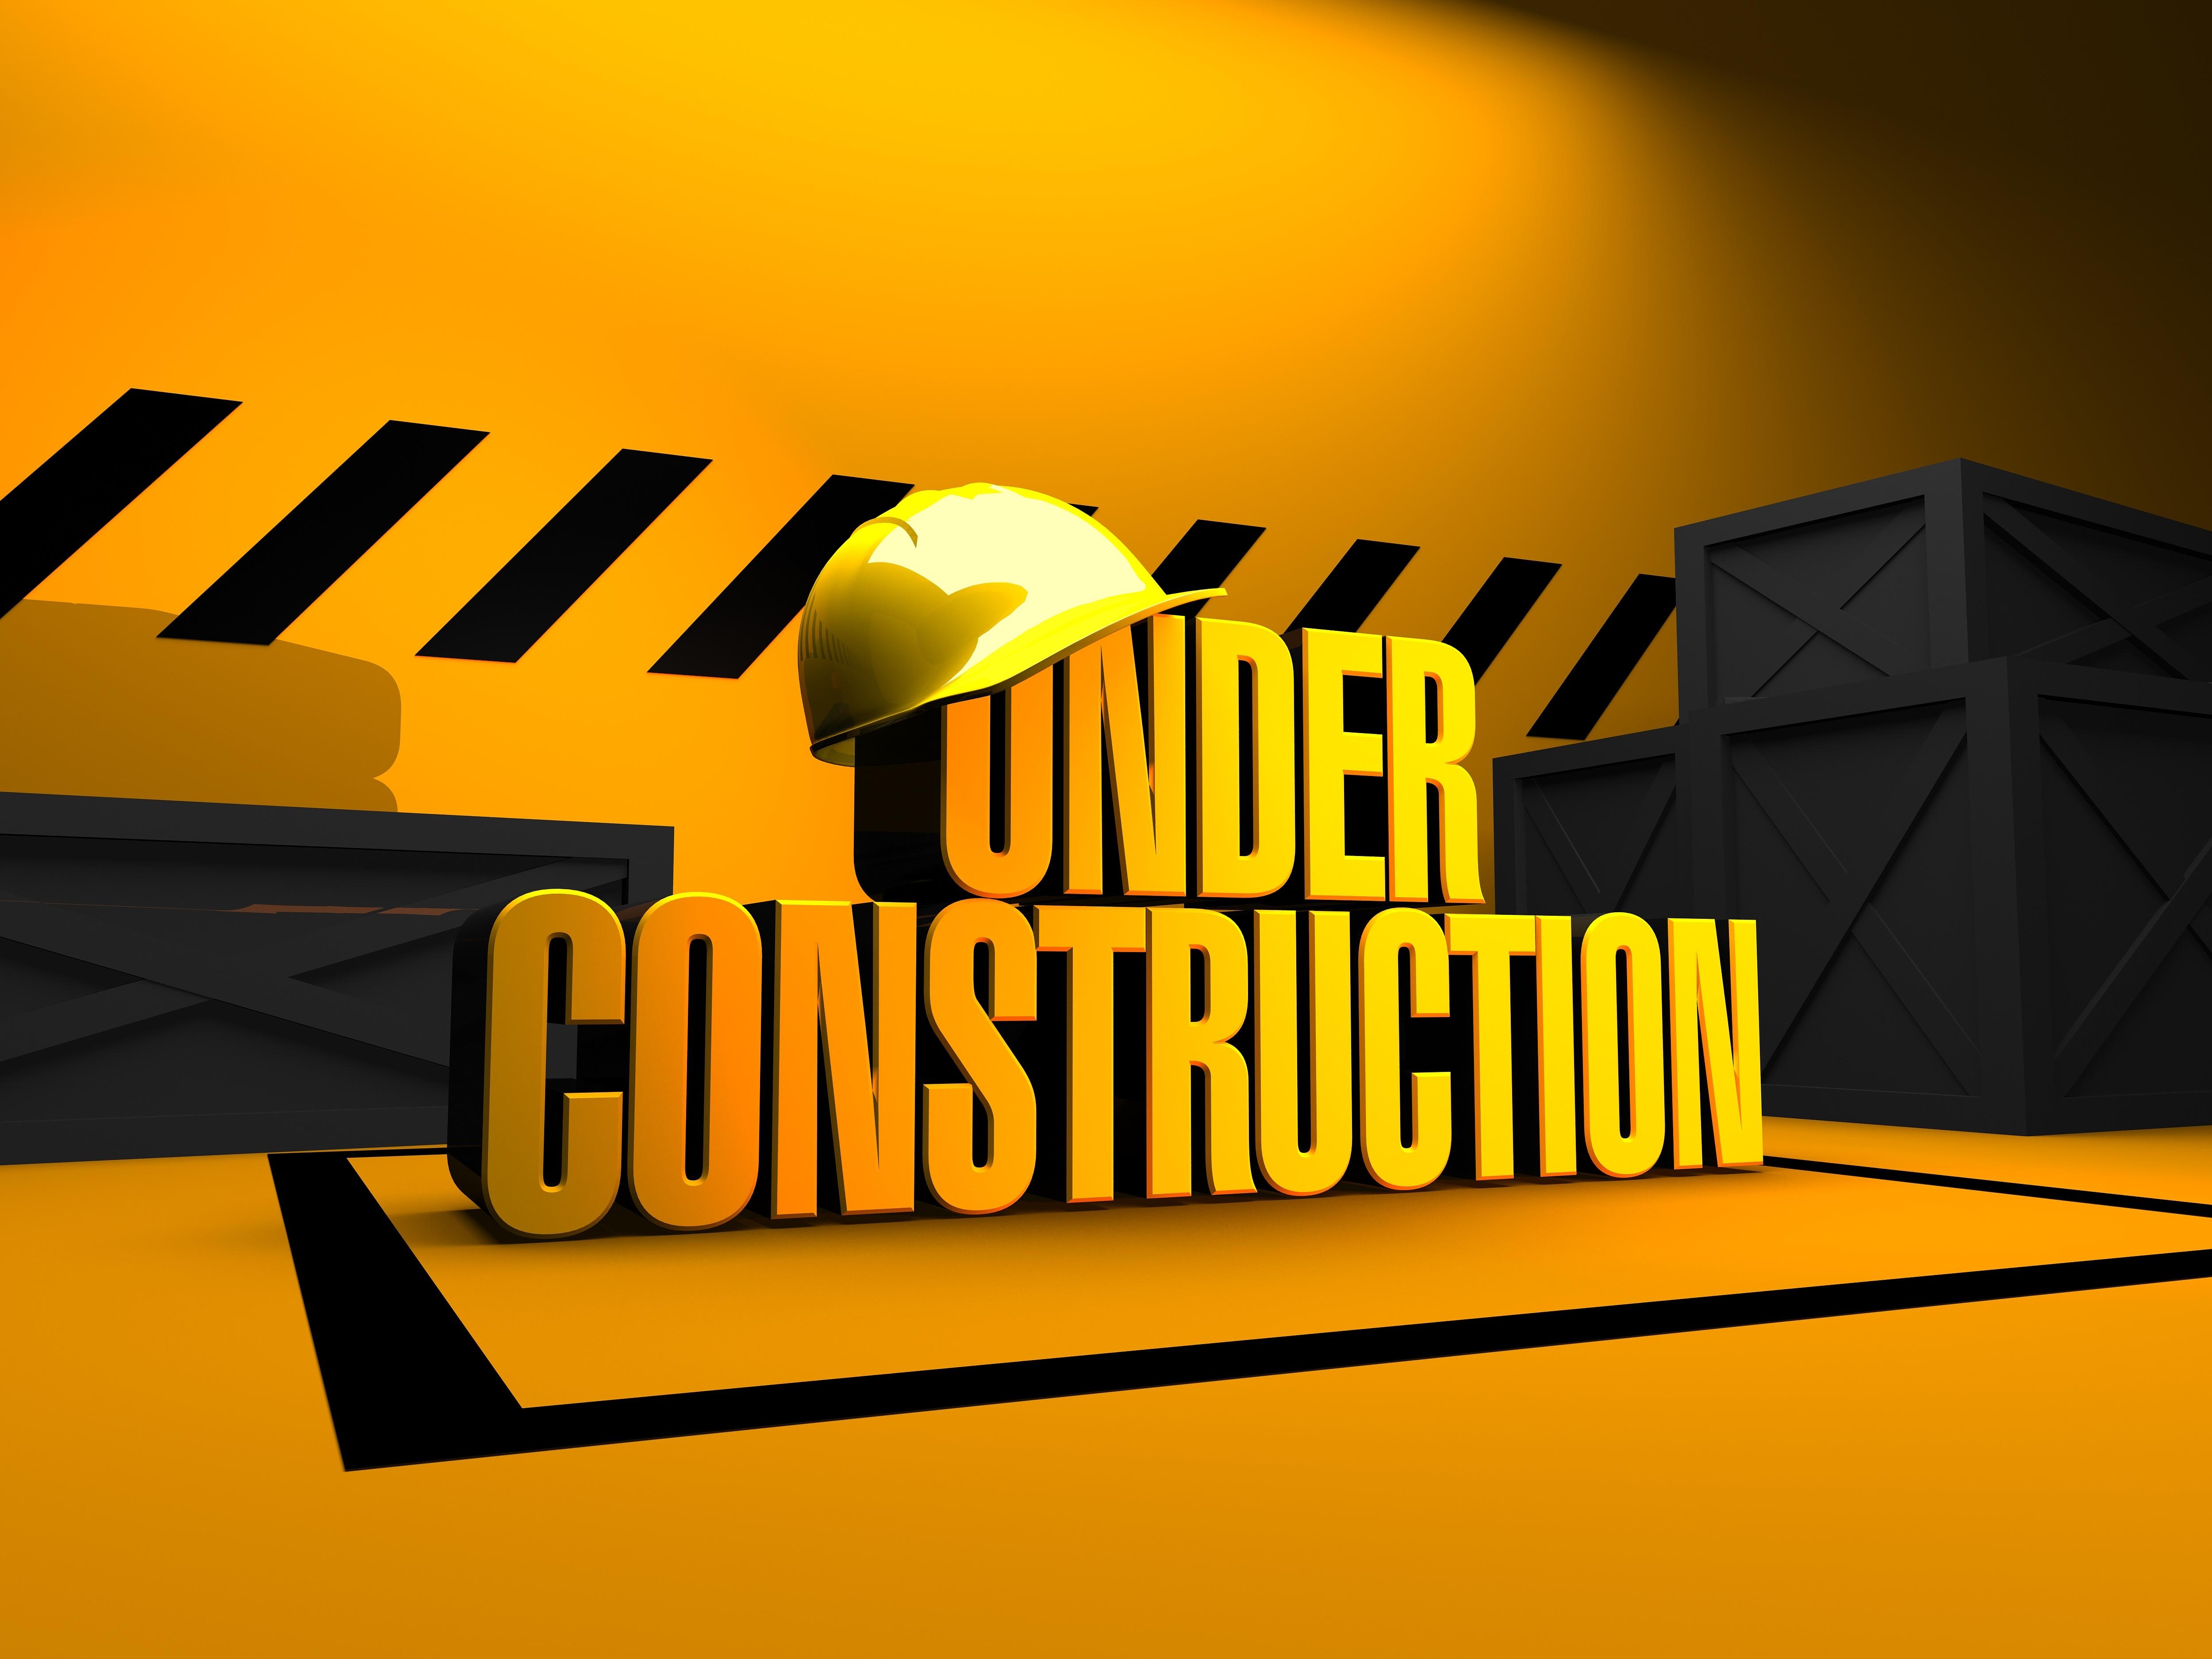 under-construction-2891888